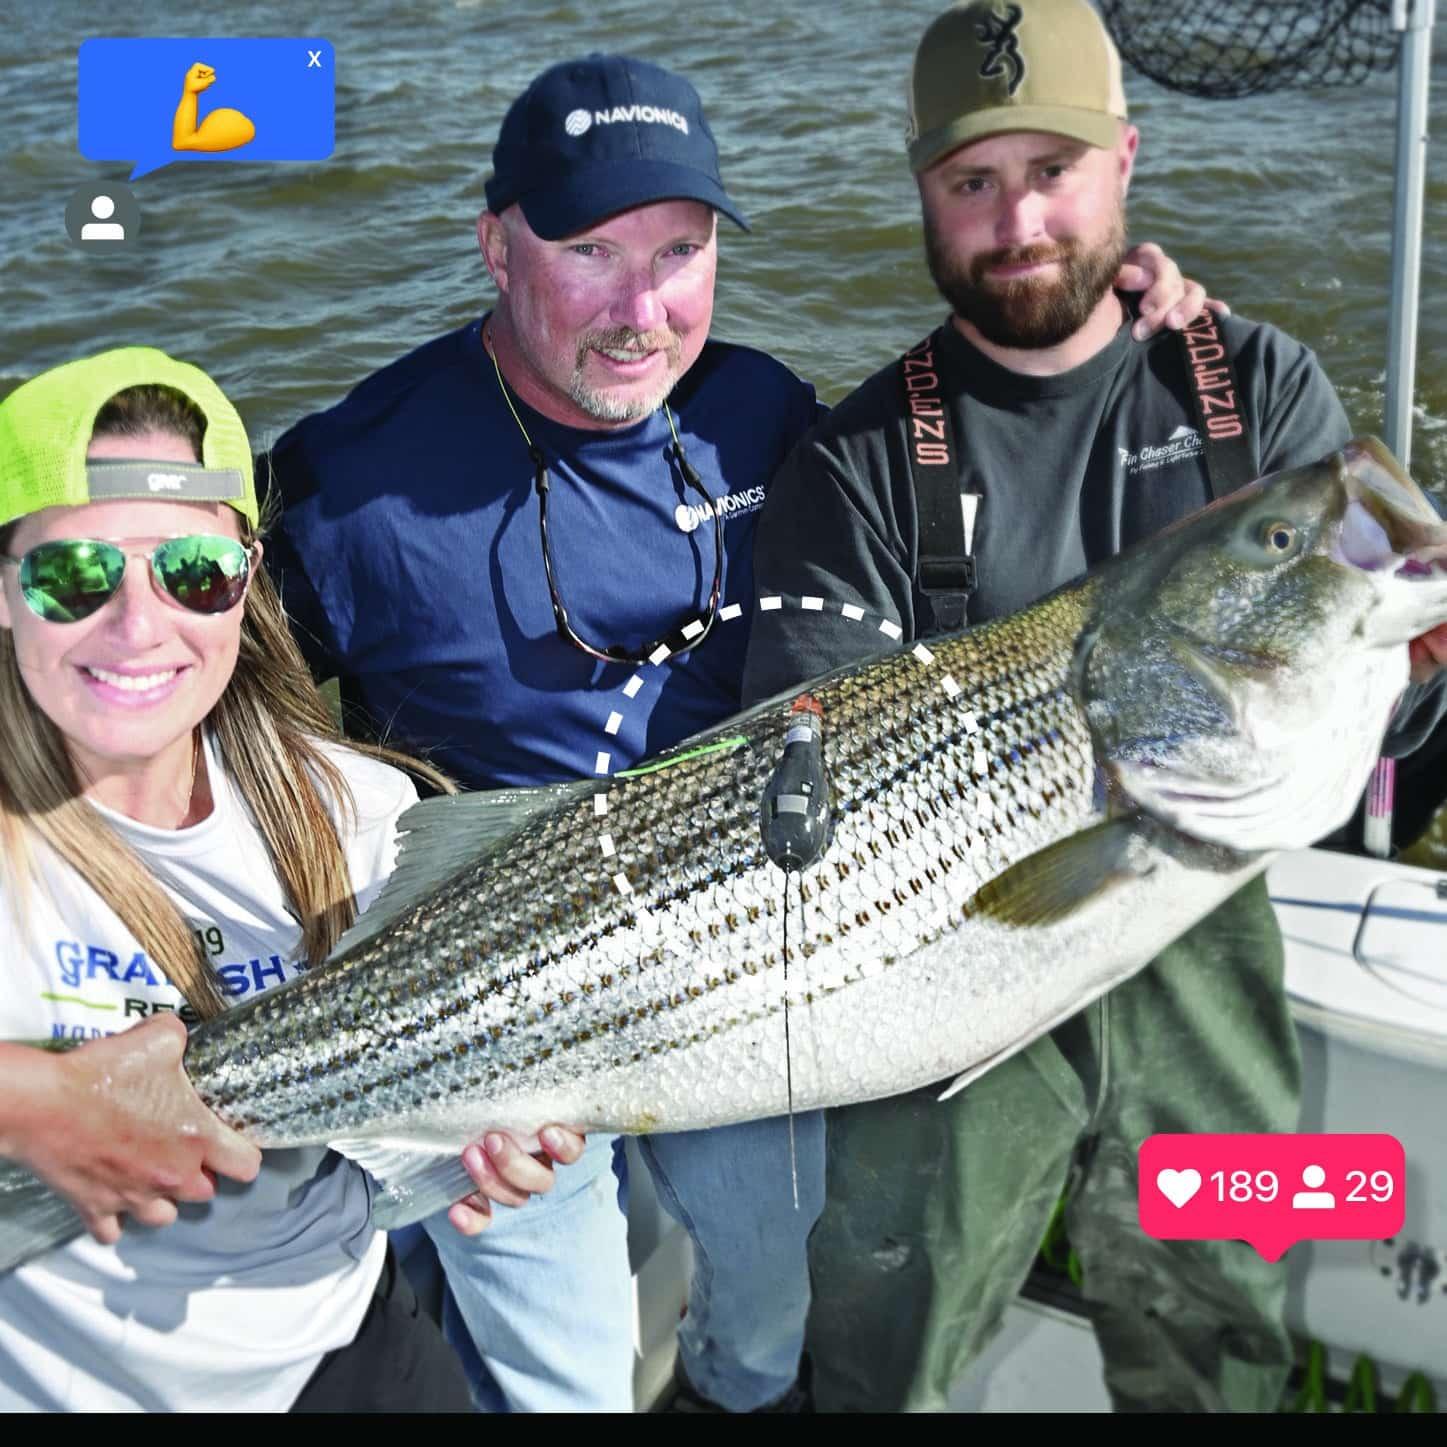 satellite tagging striped bass